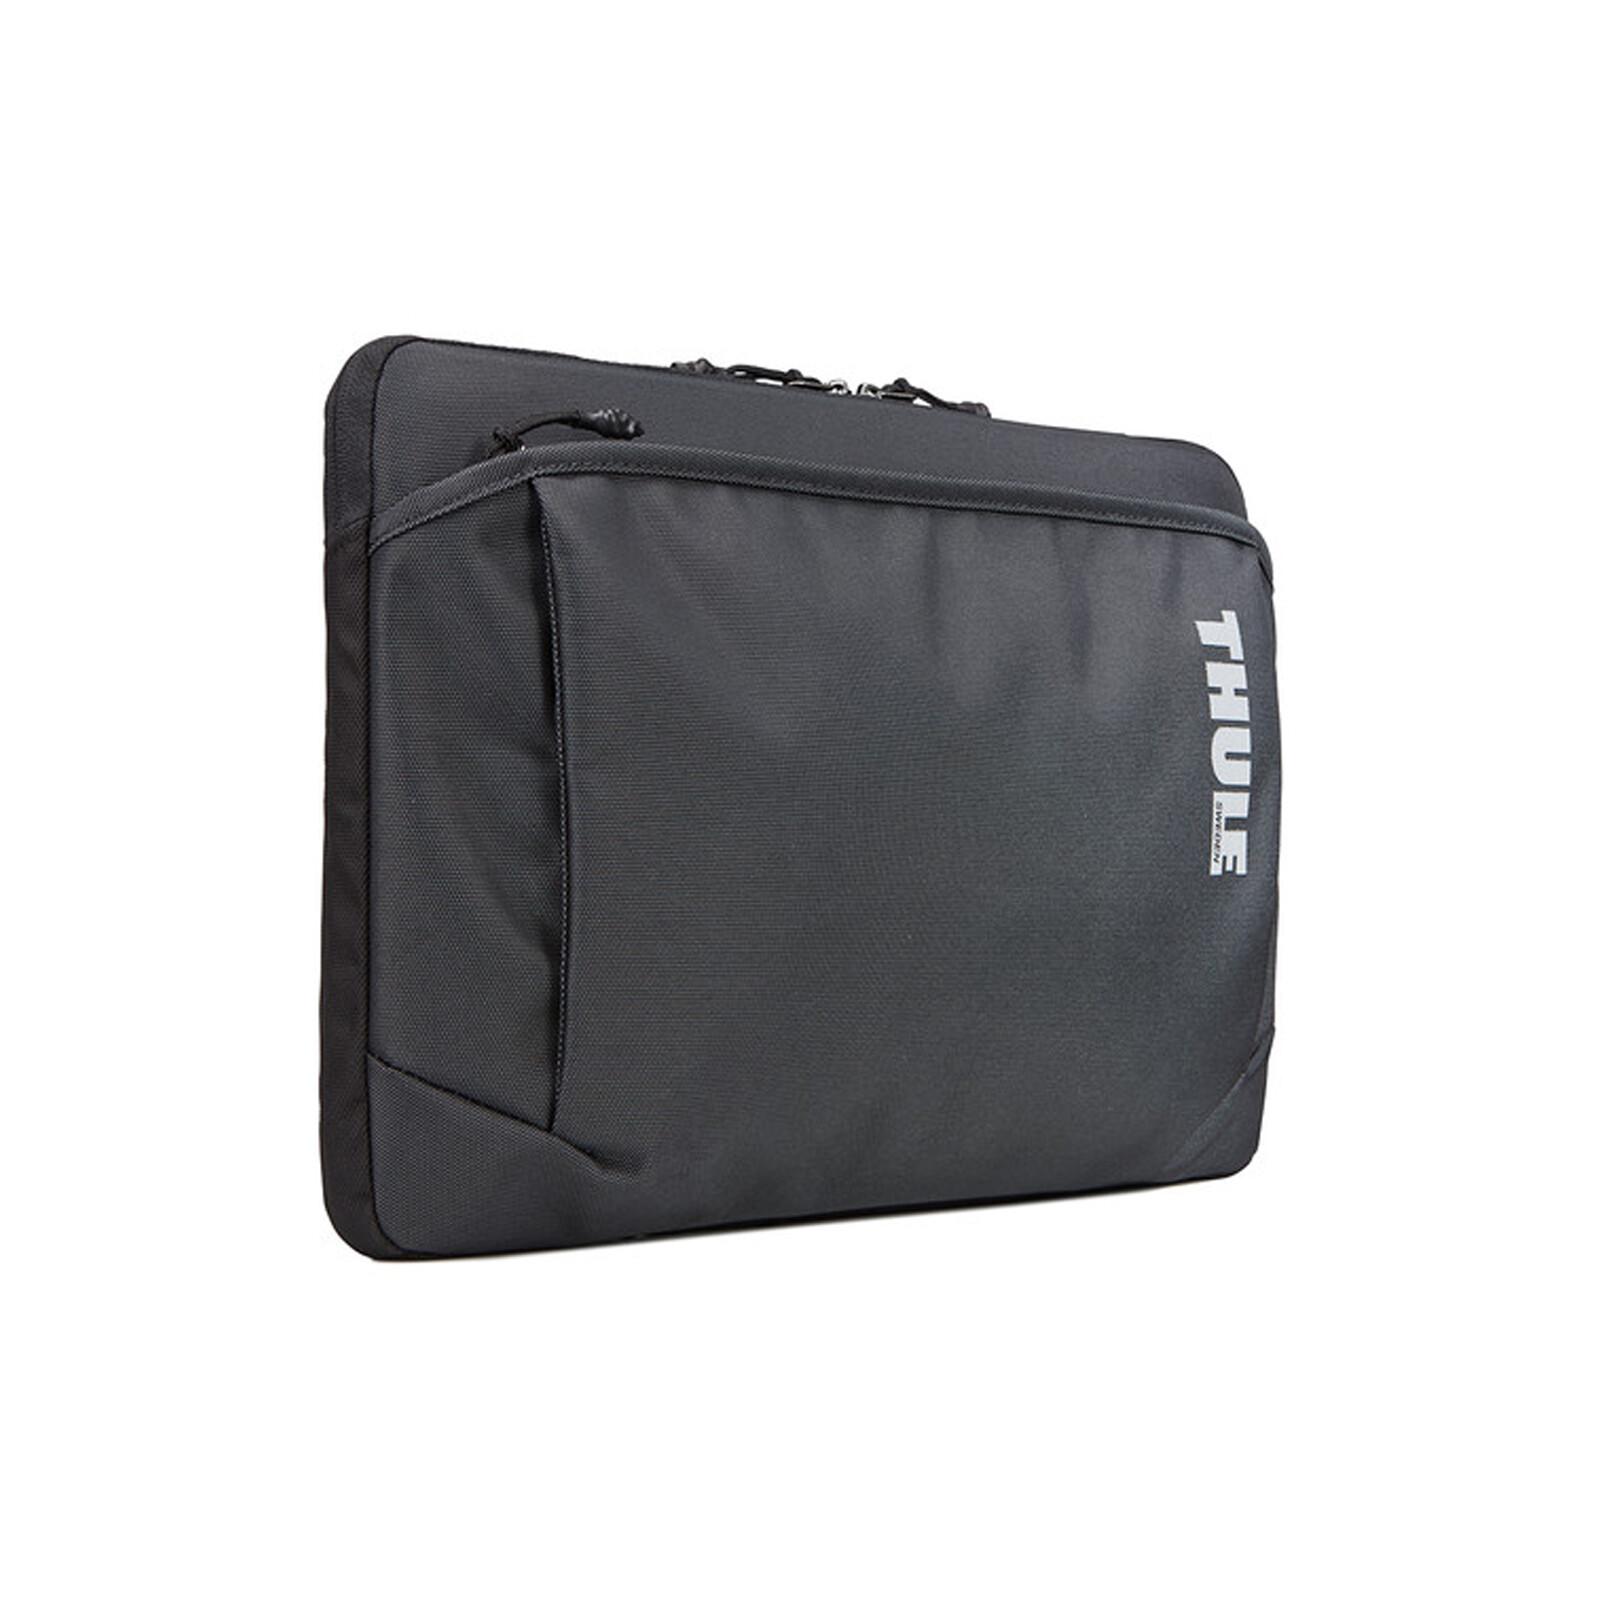 "Thule Subterra Sleeve 12"" MacBook Pro"